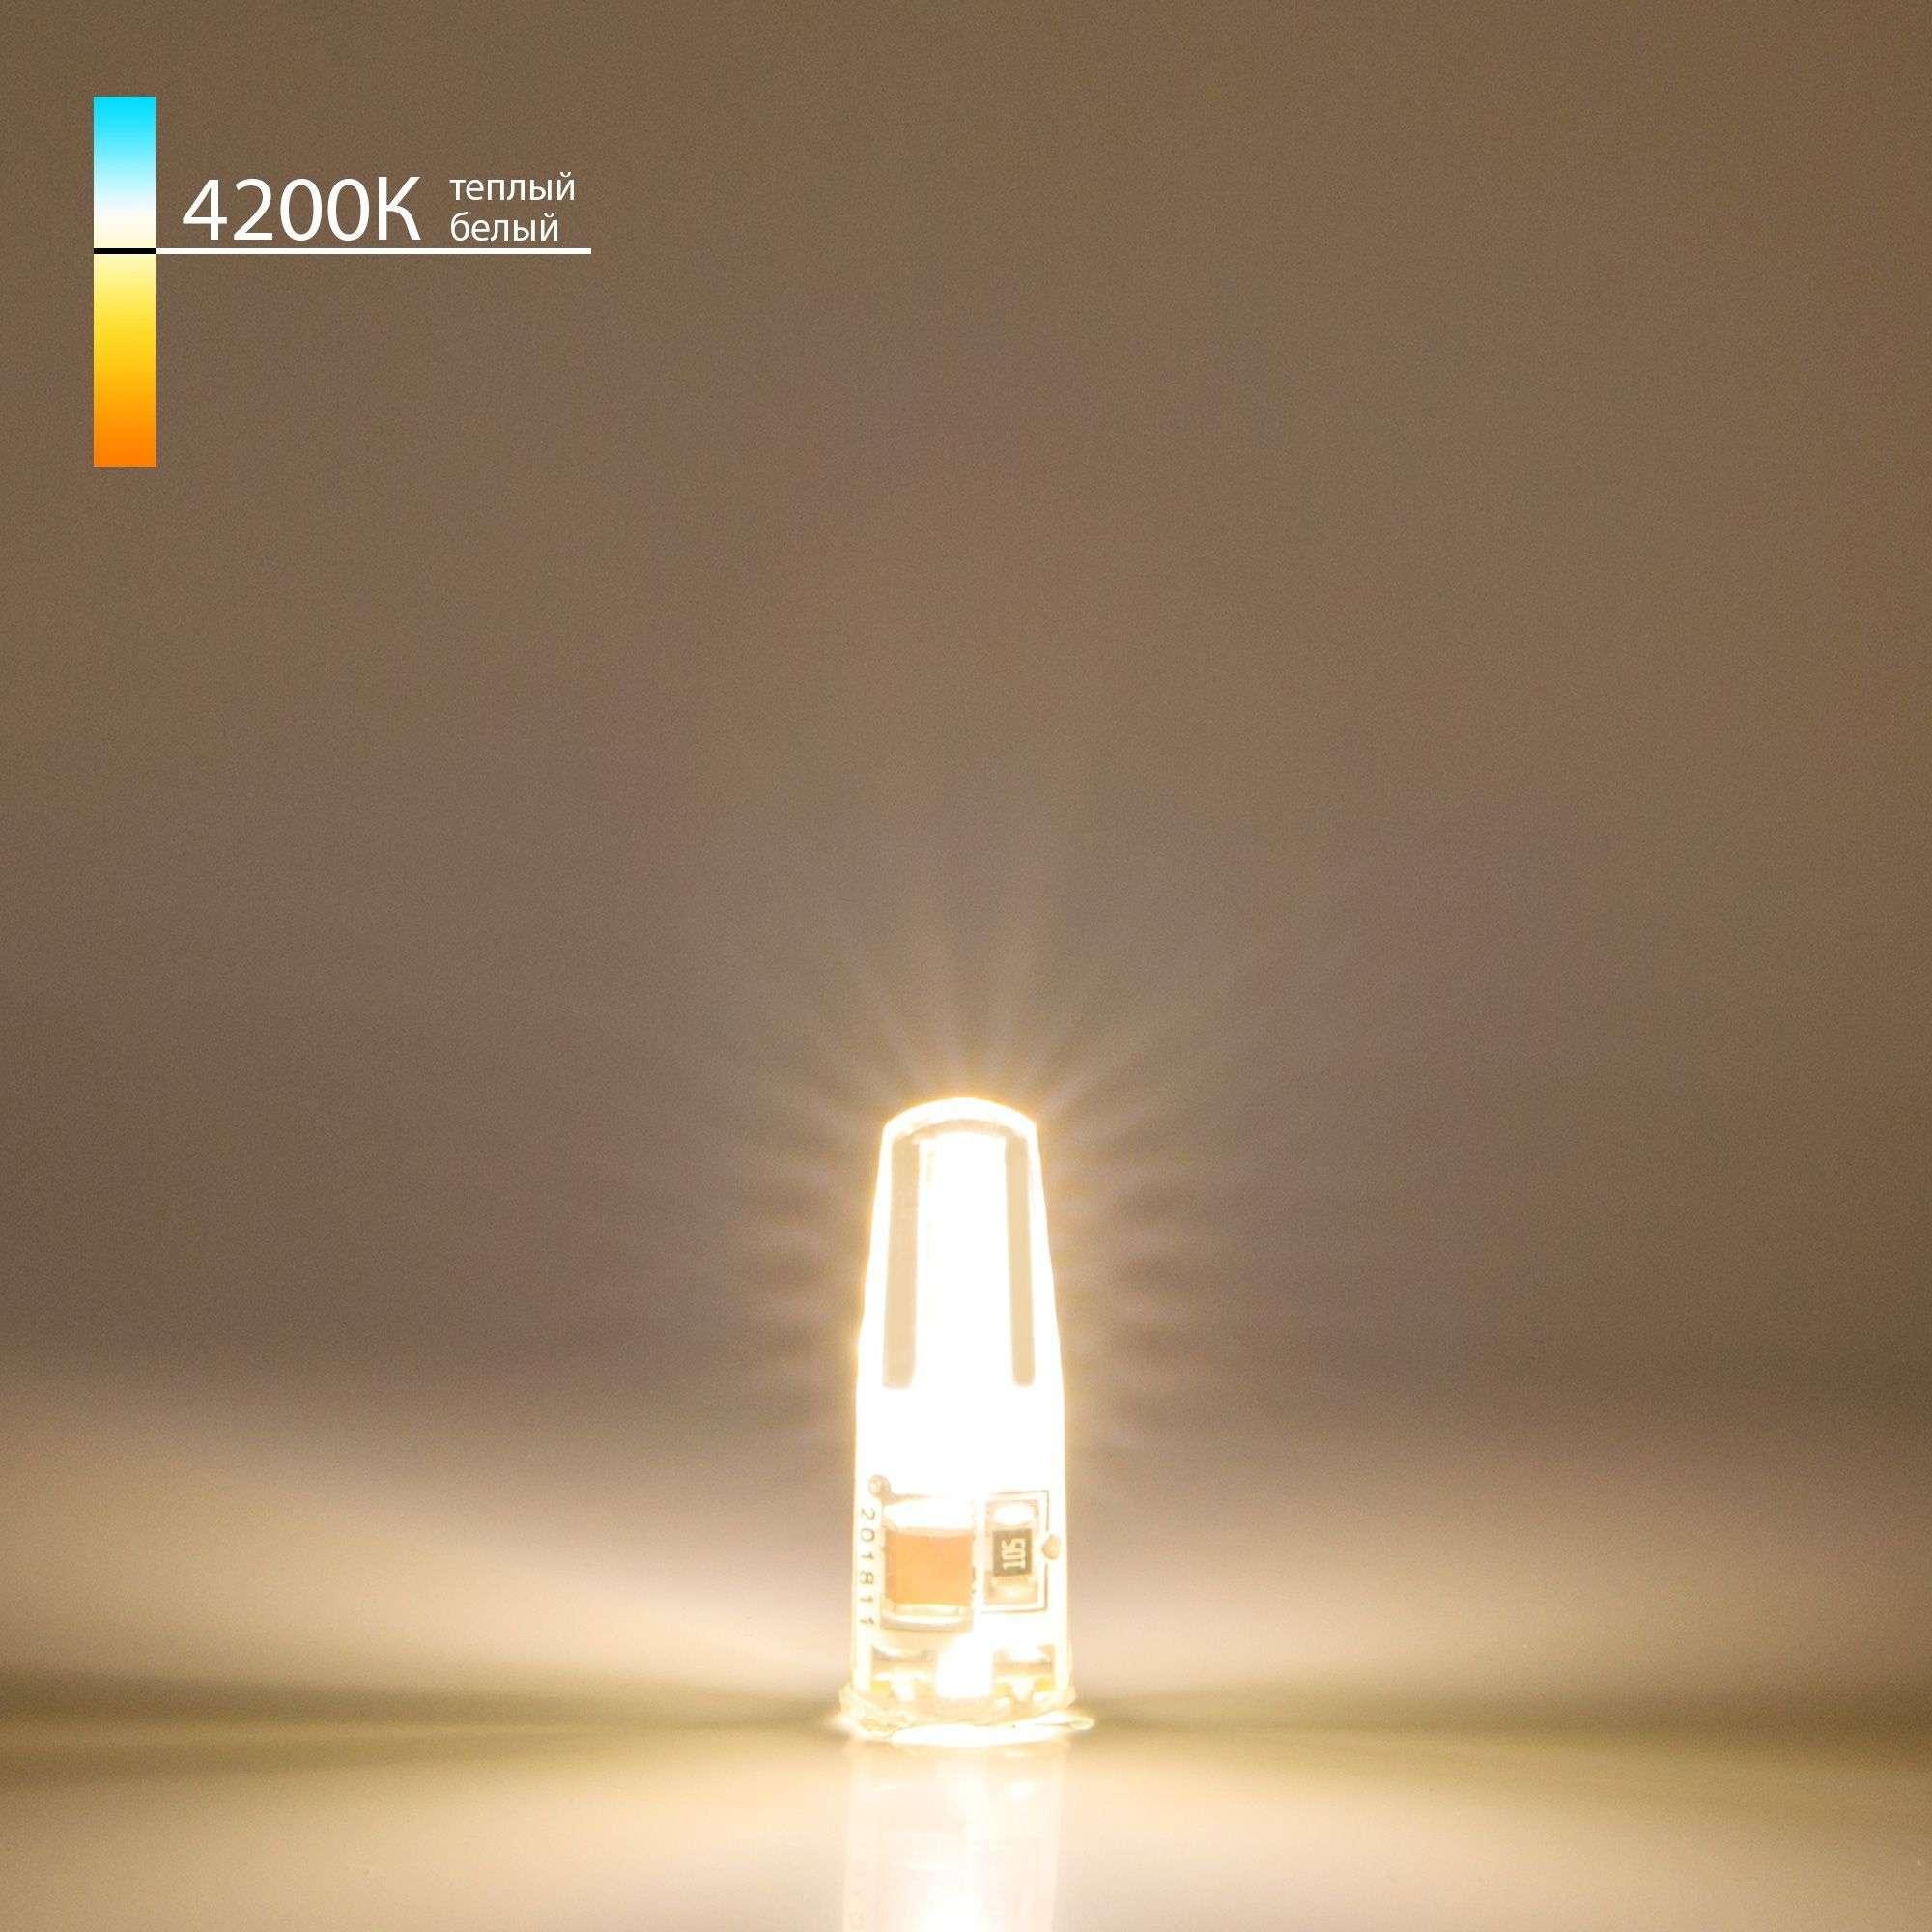 Светодиодная лампа 3W 4200K G4 G4 LED BL124 3W 220V 360 4200K